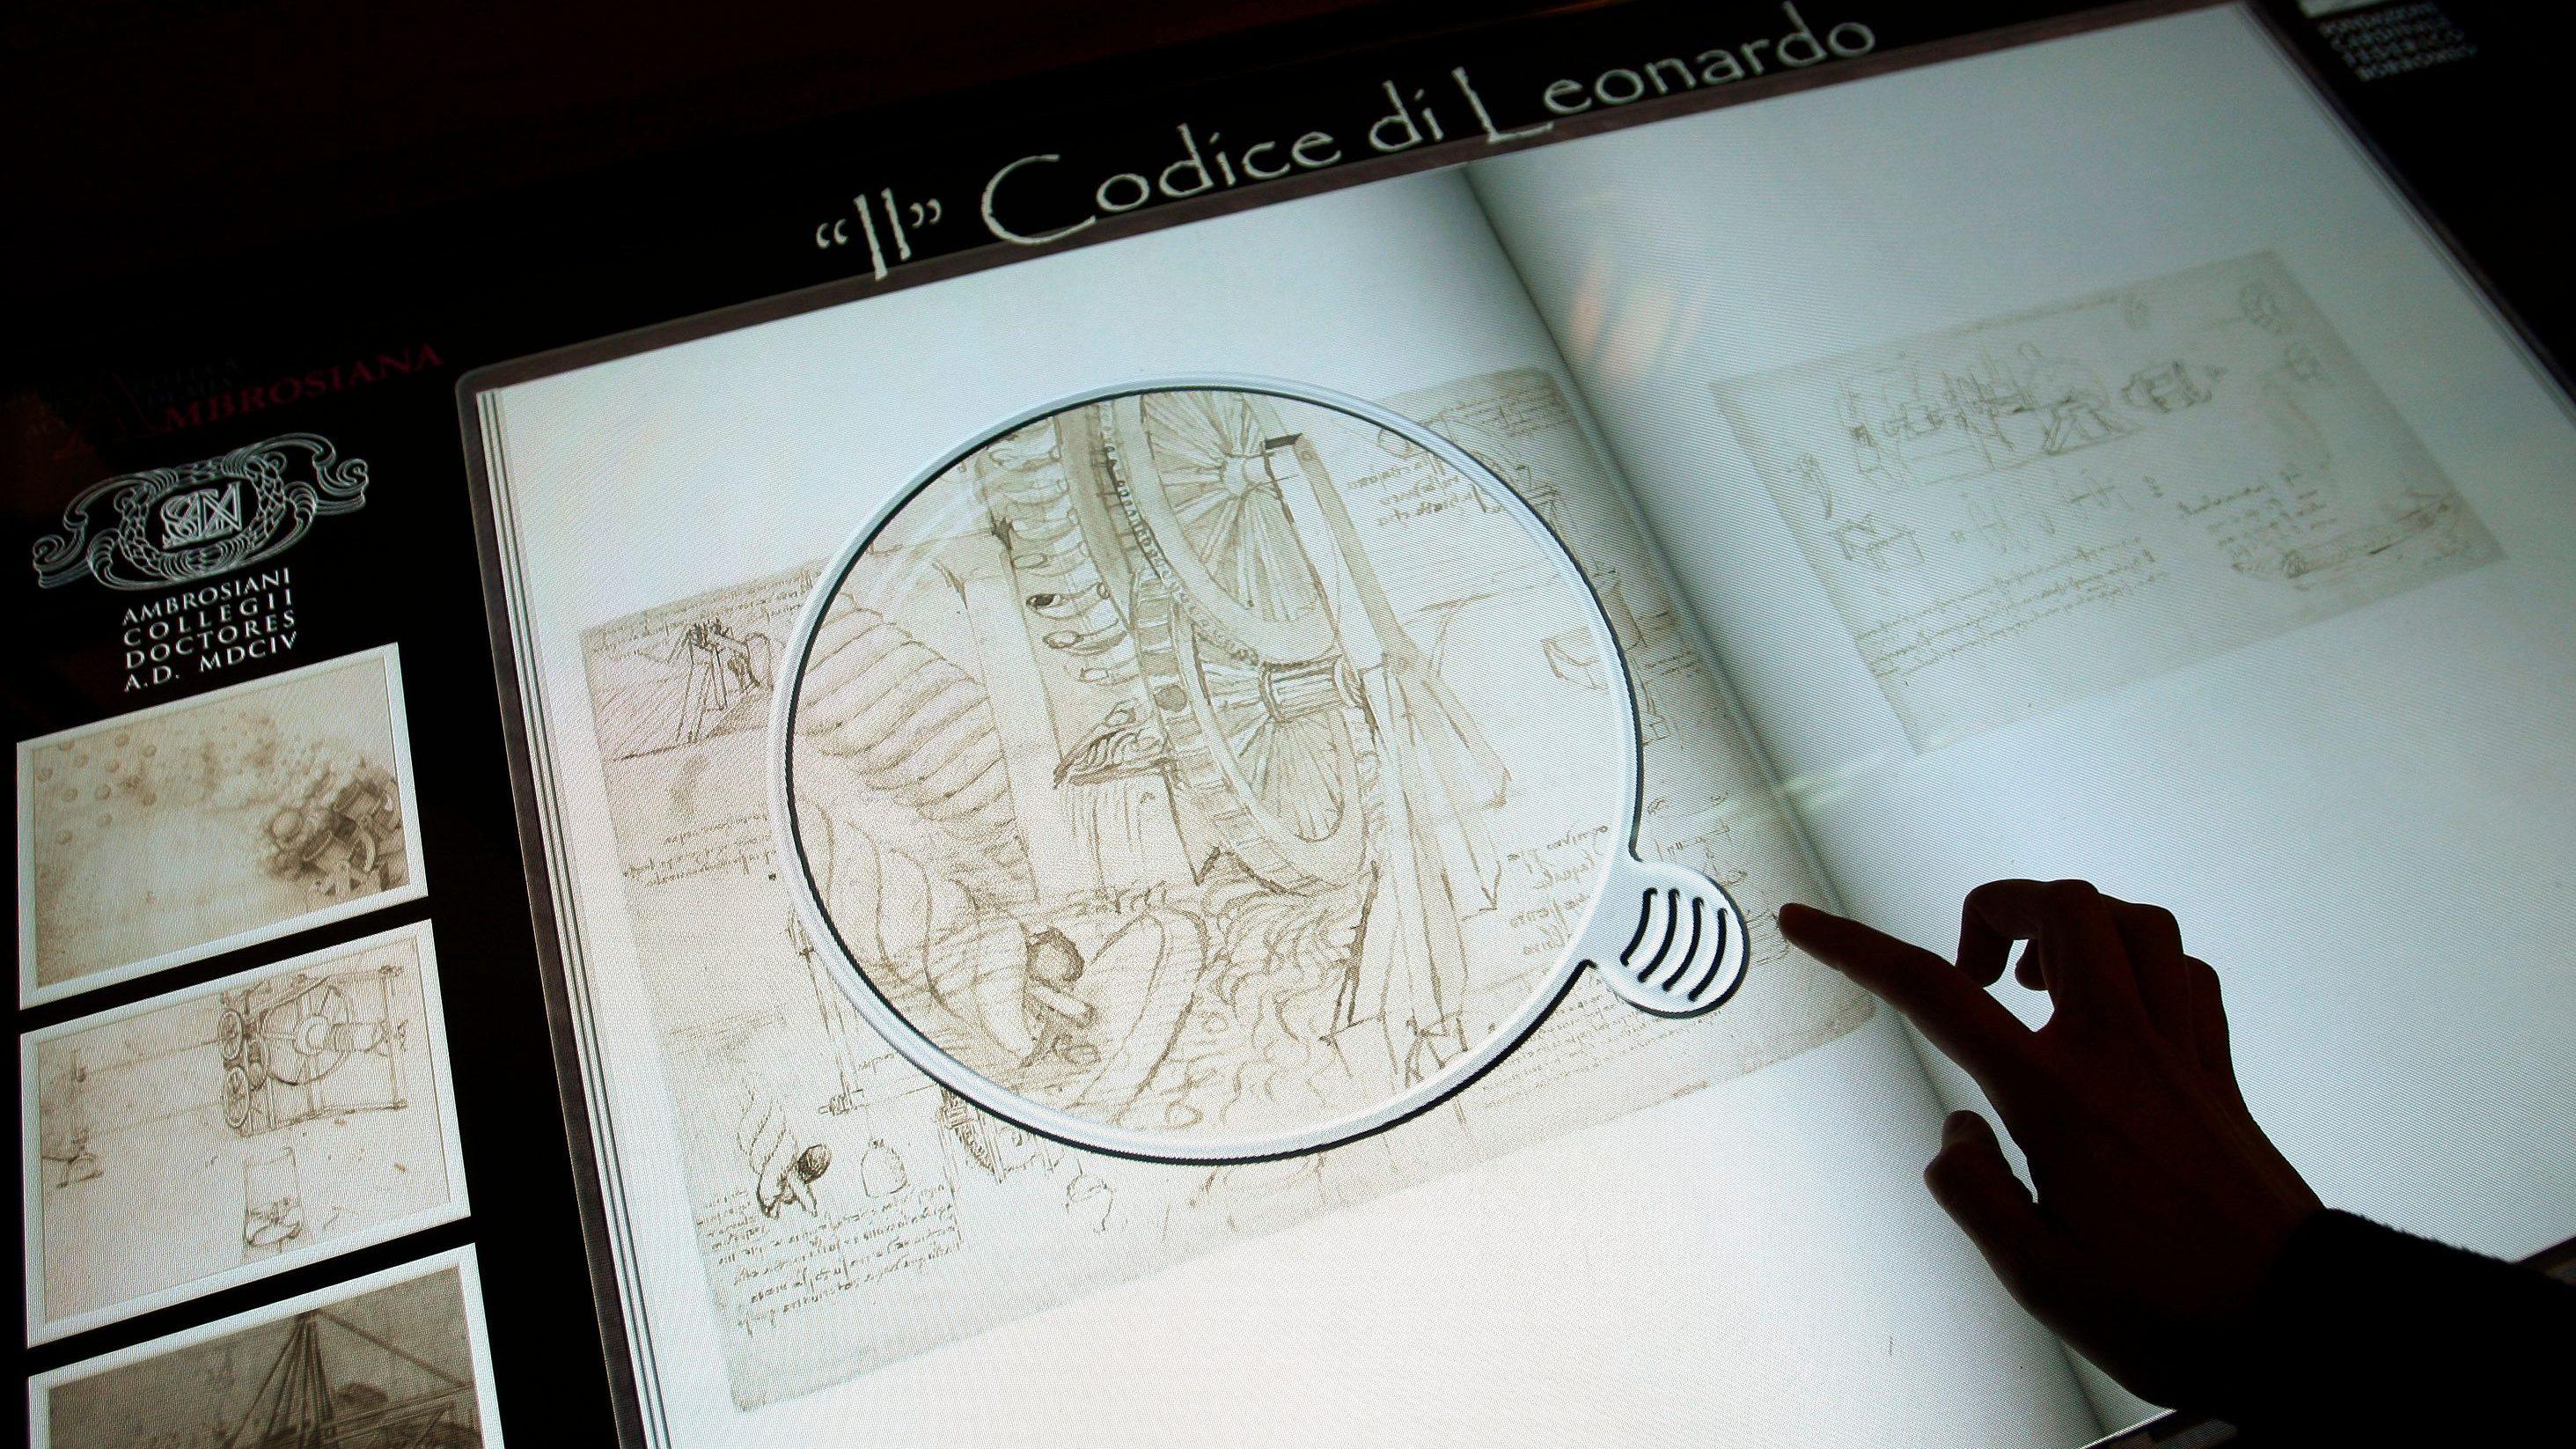 Leonardo da Vinci showed how art can advance scientific progress